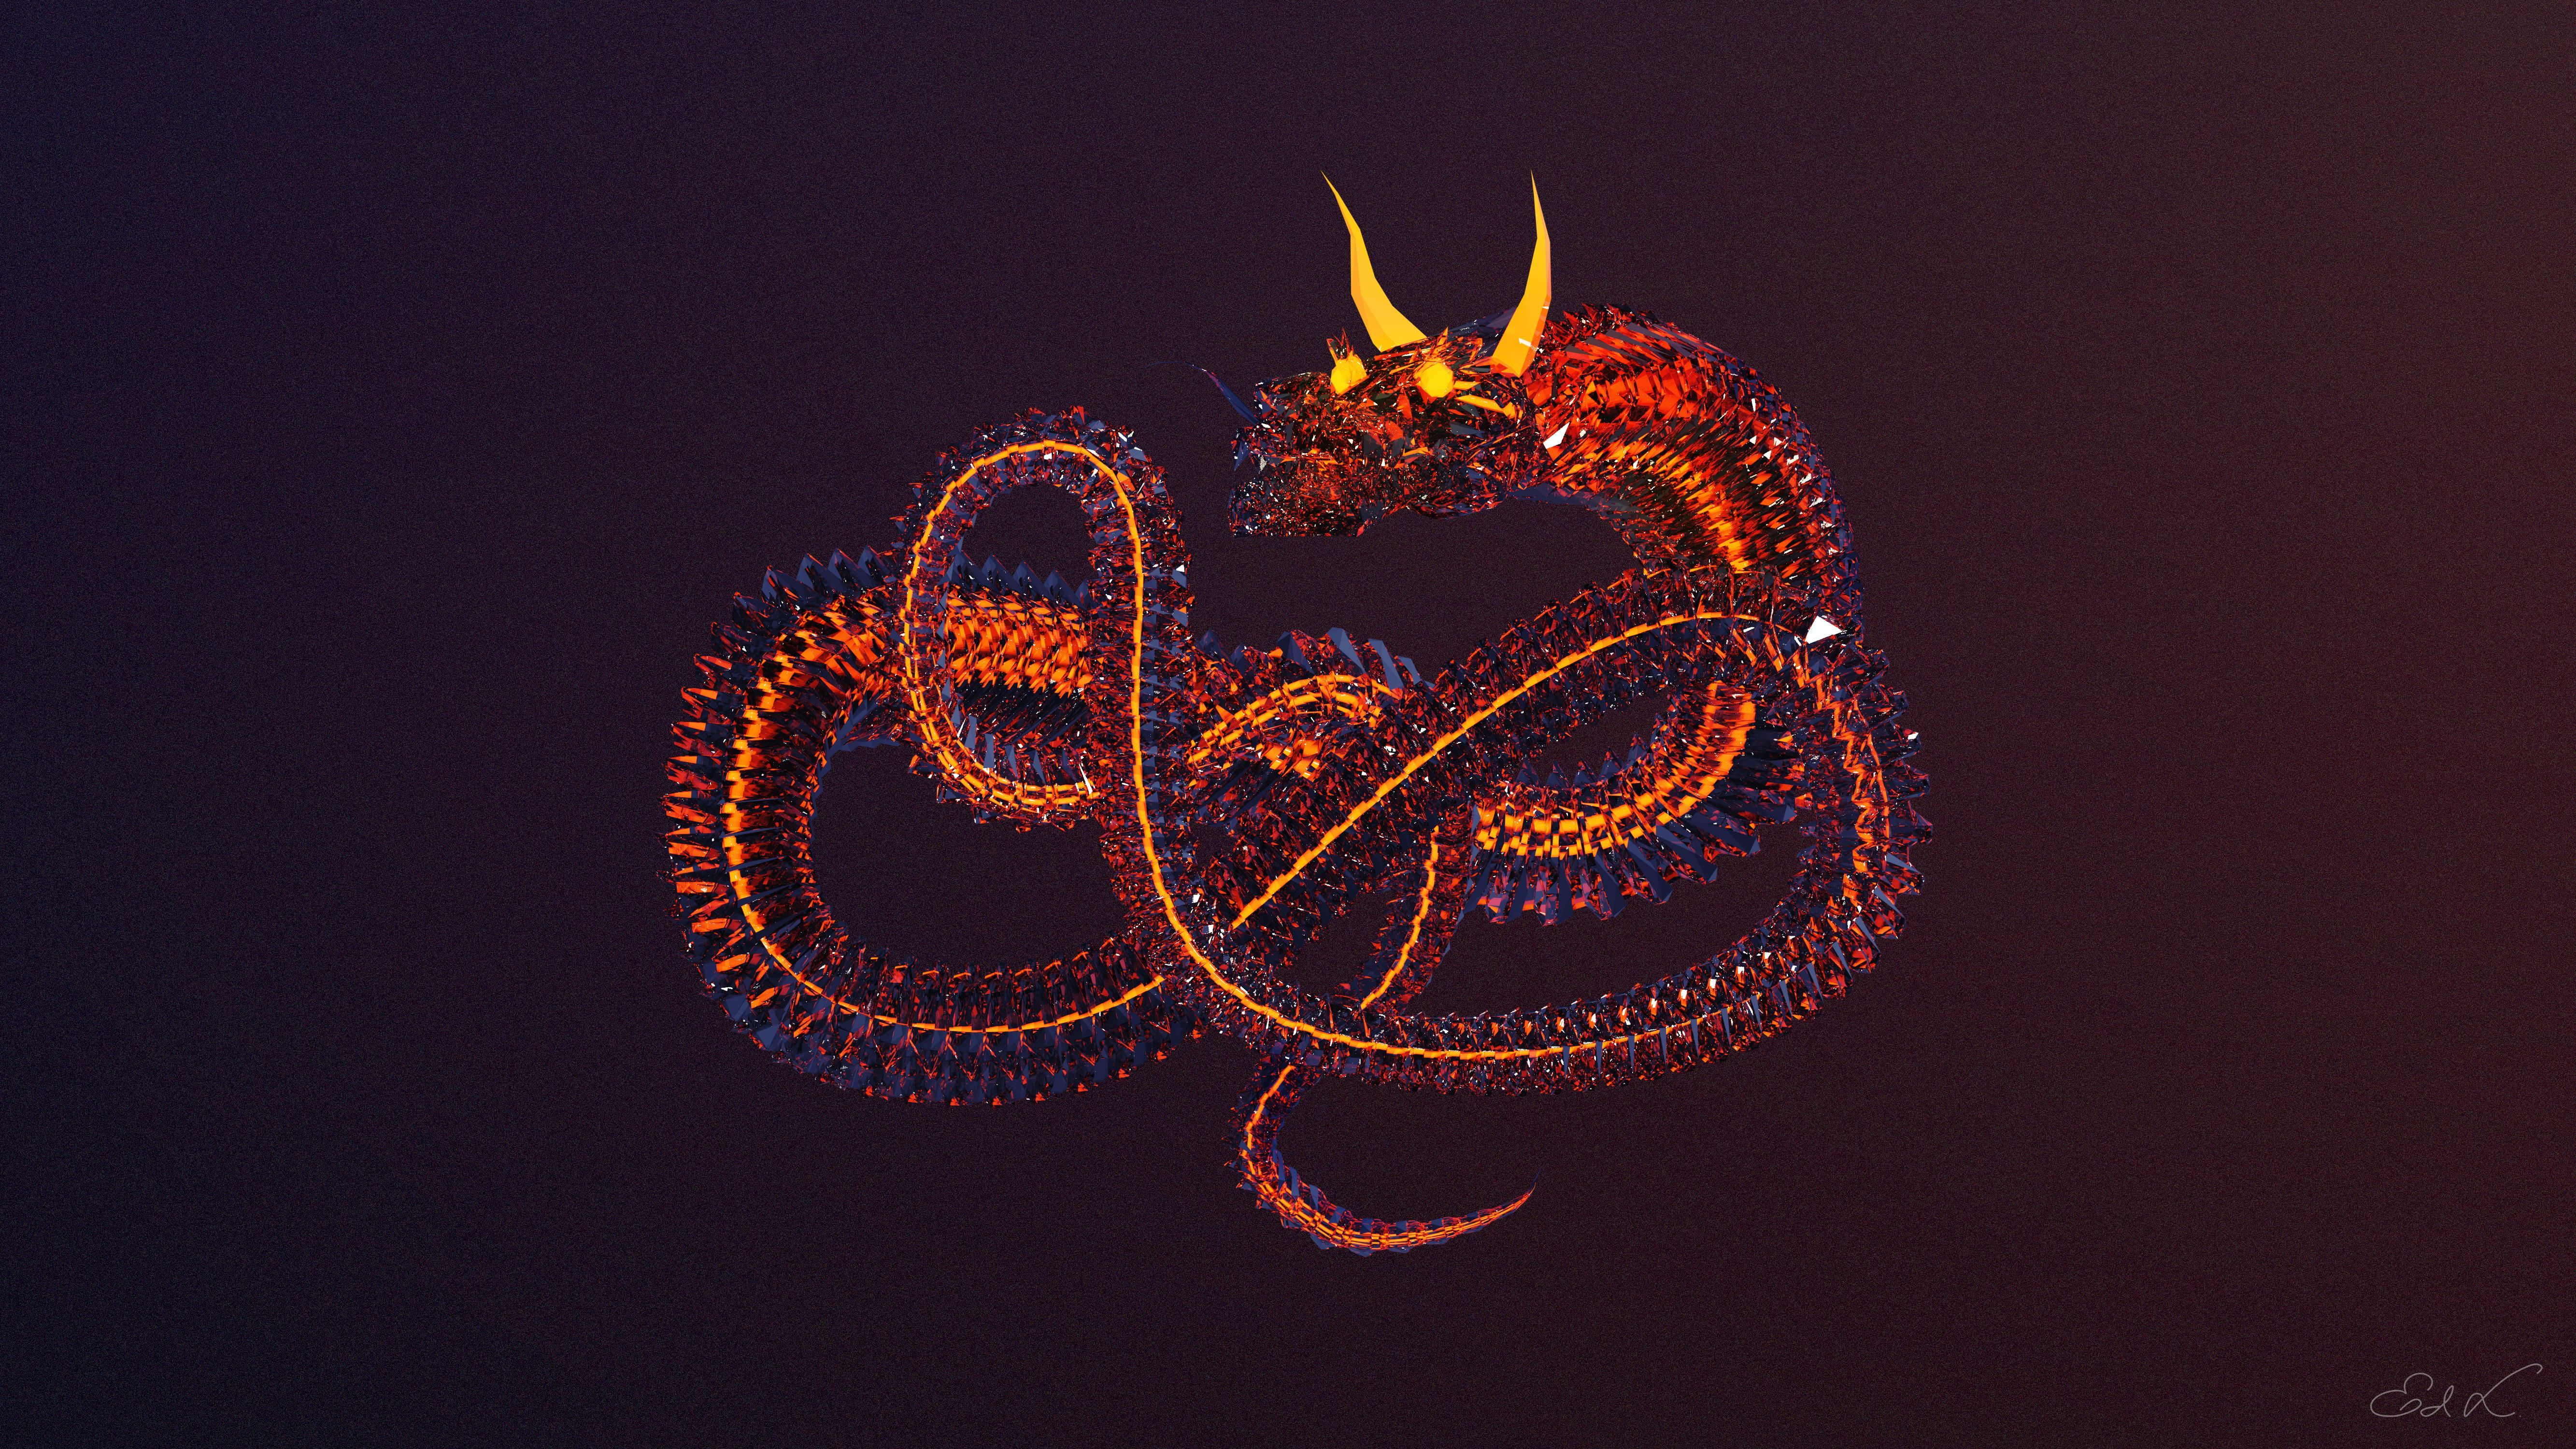 Fire hunter Digital artwork 3k wallpapers Artwork Iphone 5333x3000